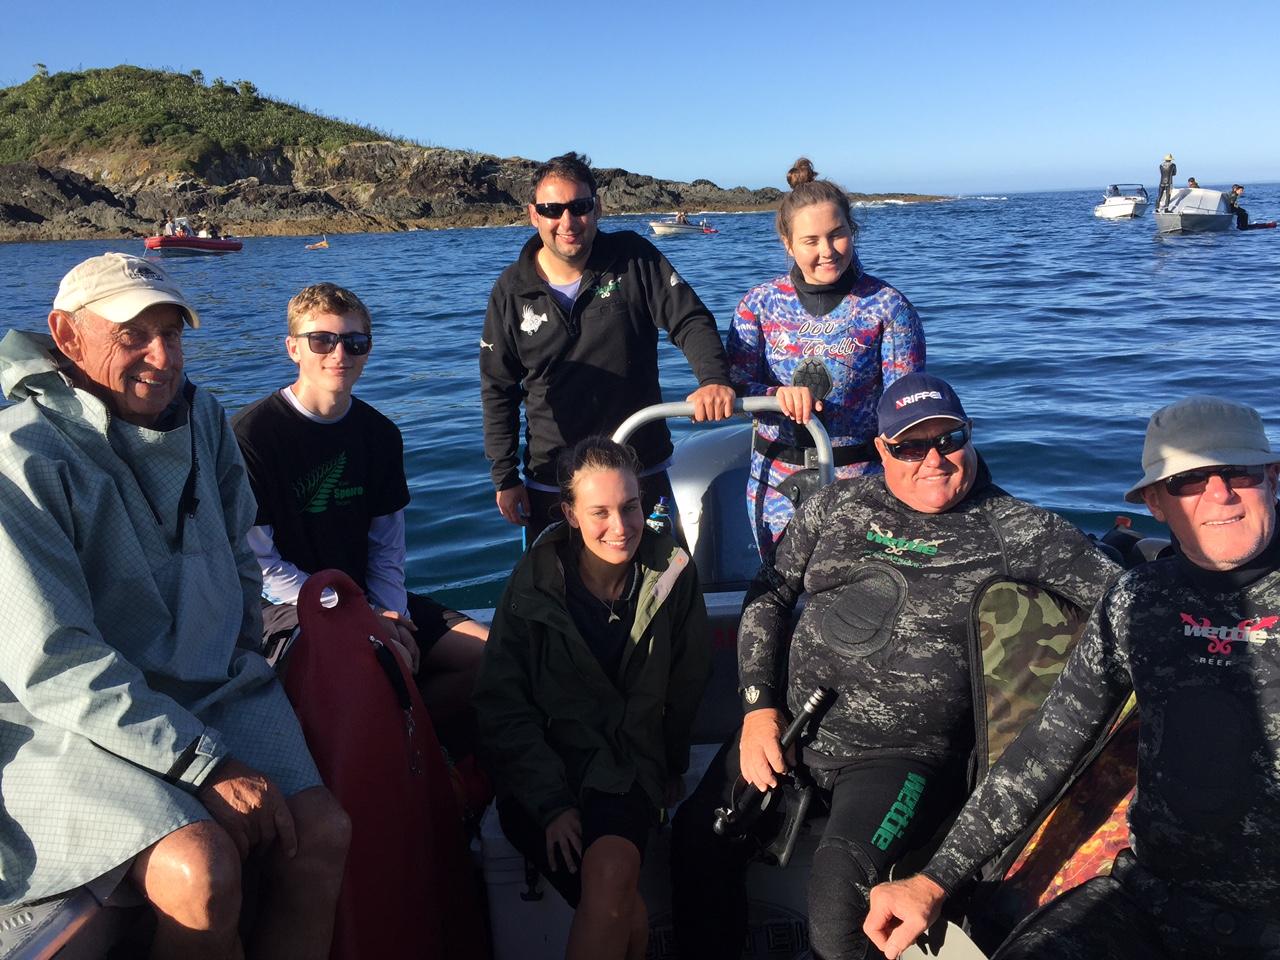 Kiwi support crew